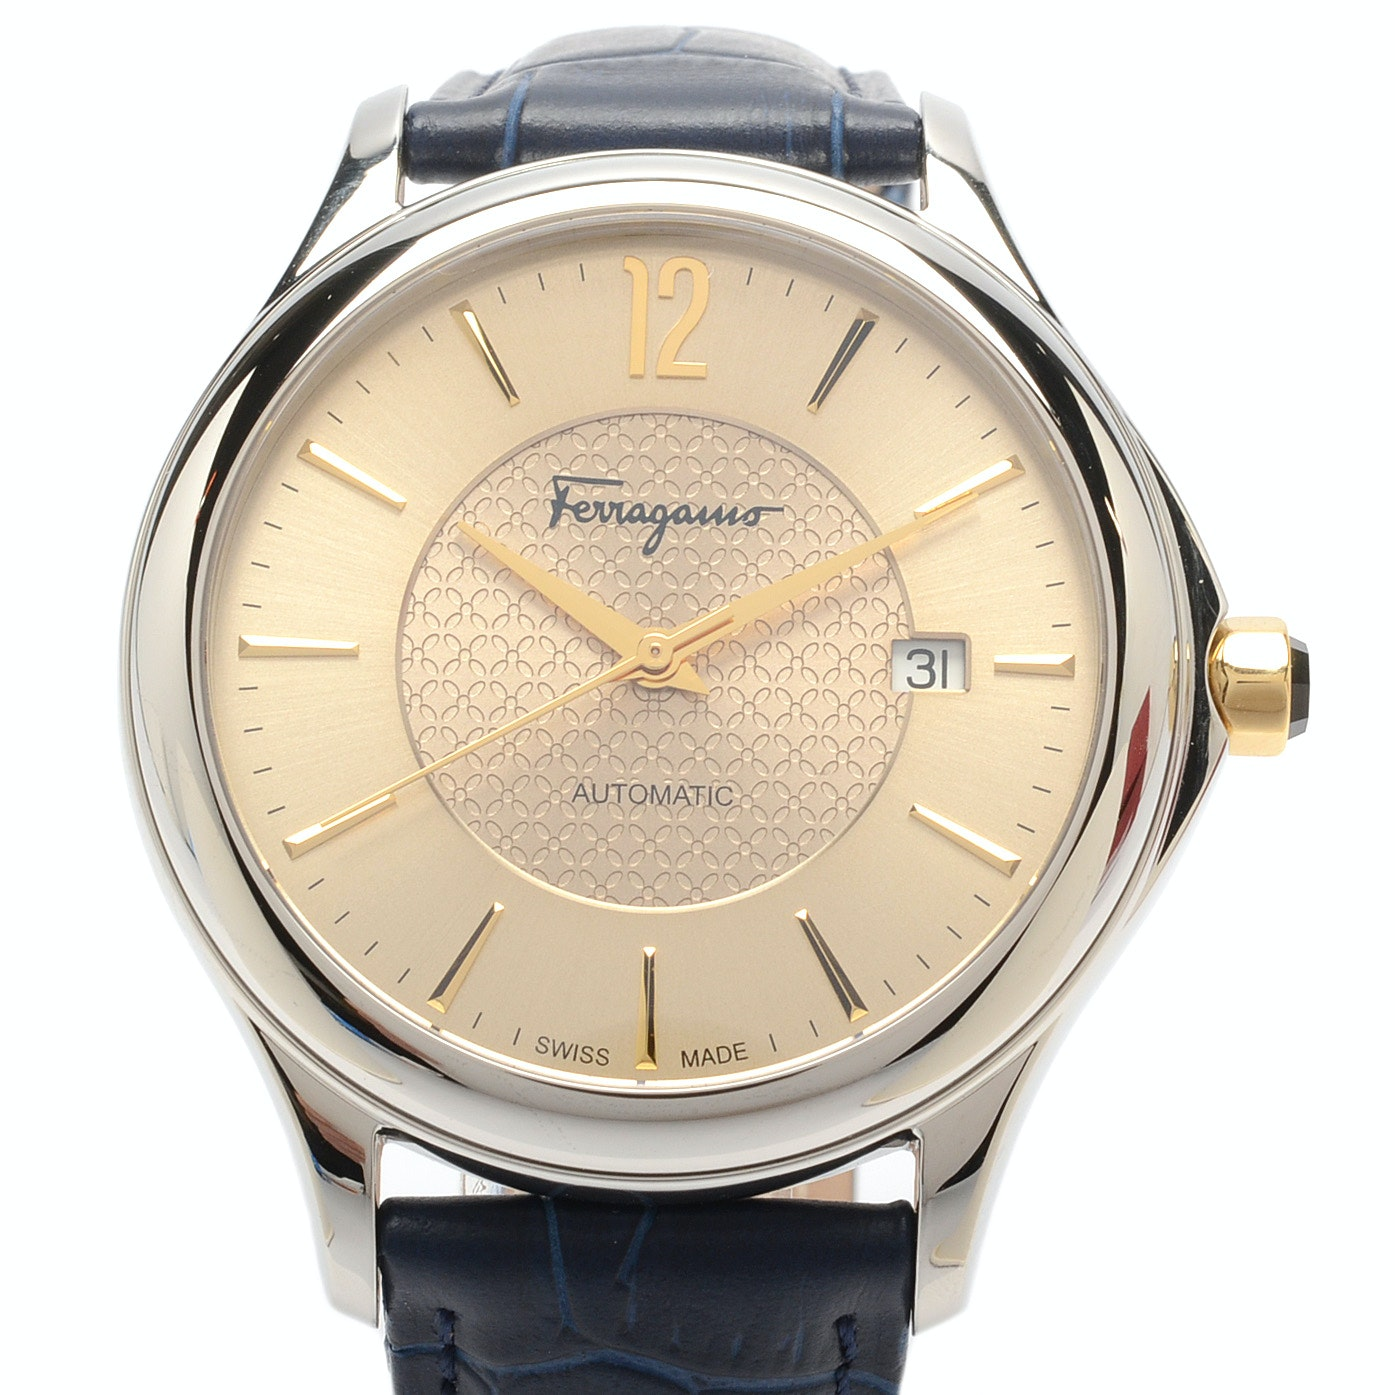 "Salvatore Ferragamo ""Time Automatic"" Swiss Wristwatch"